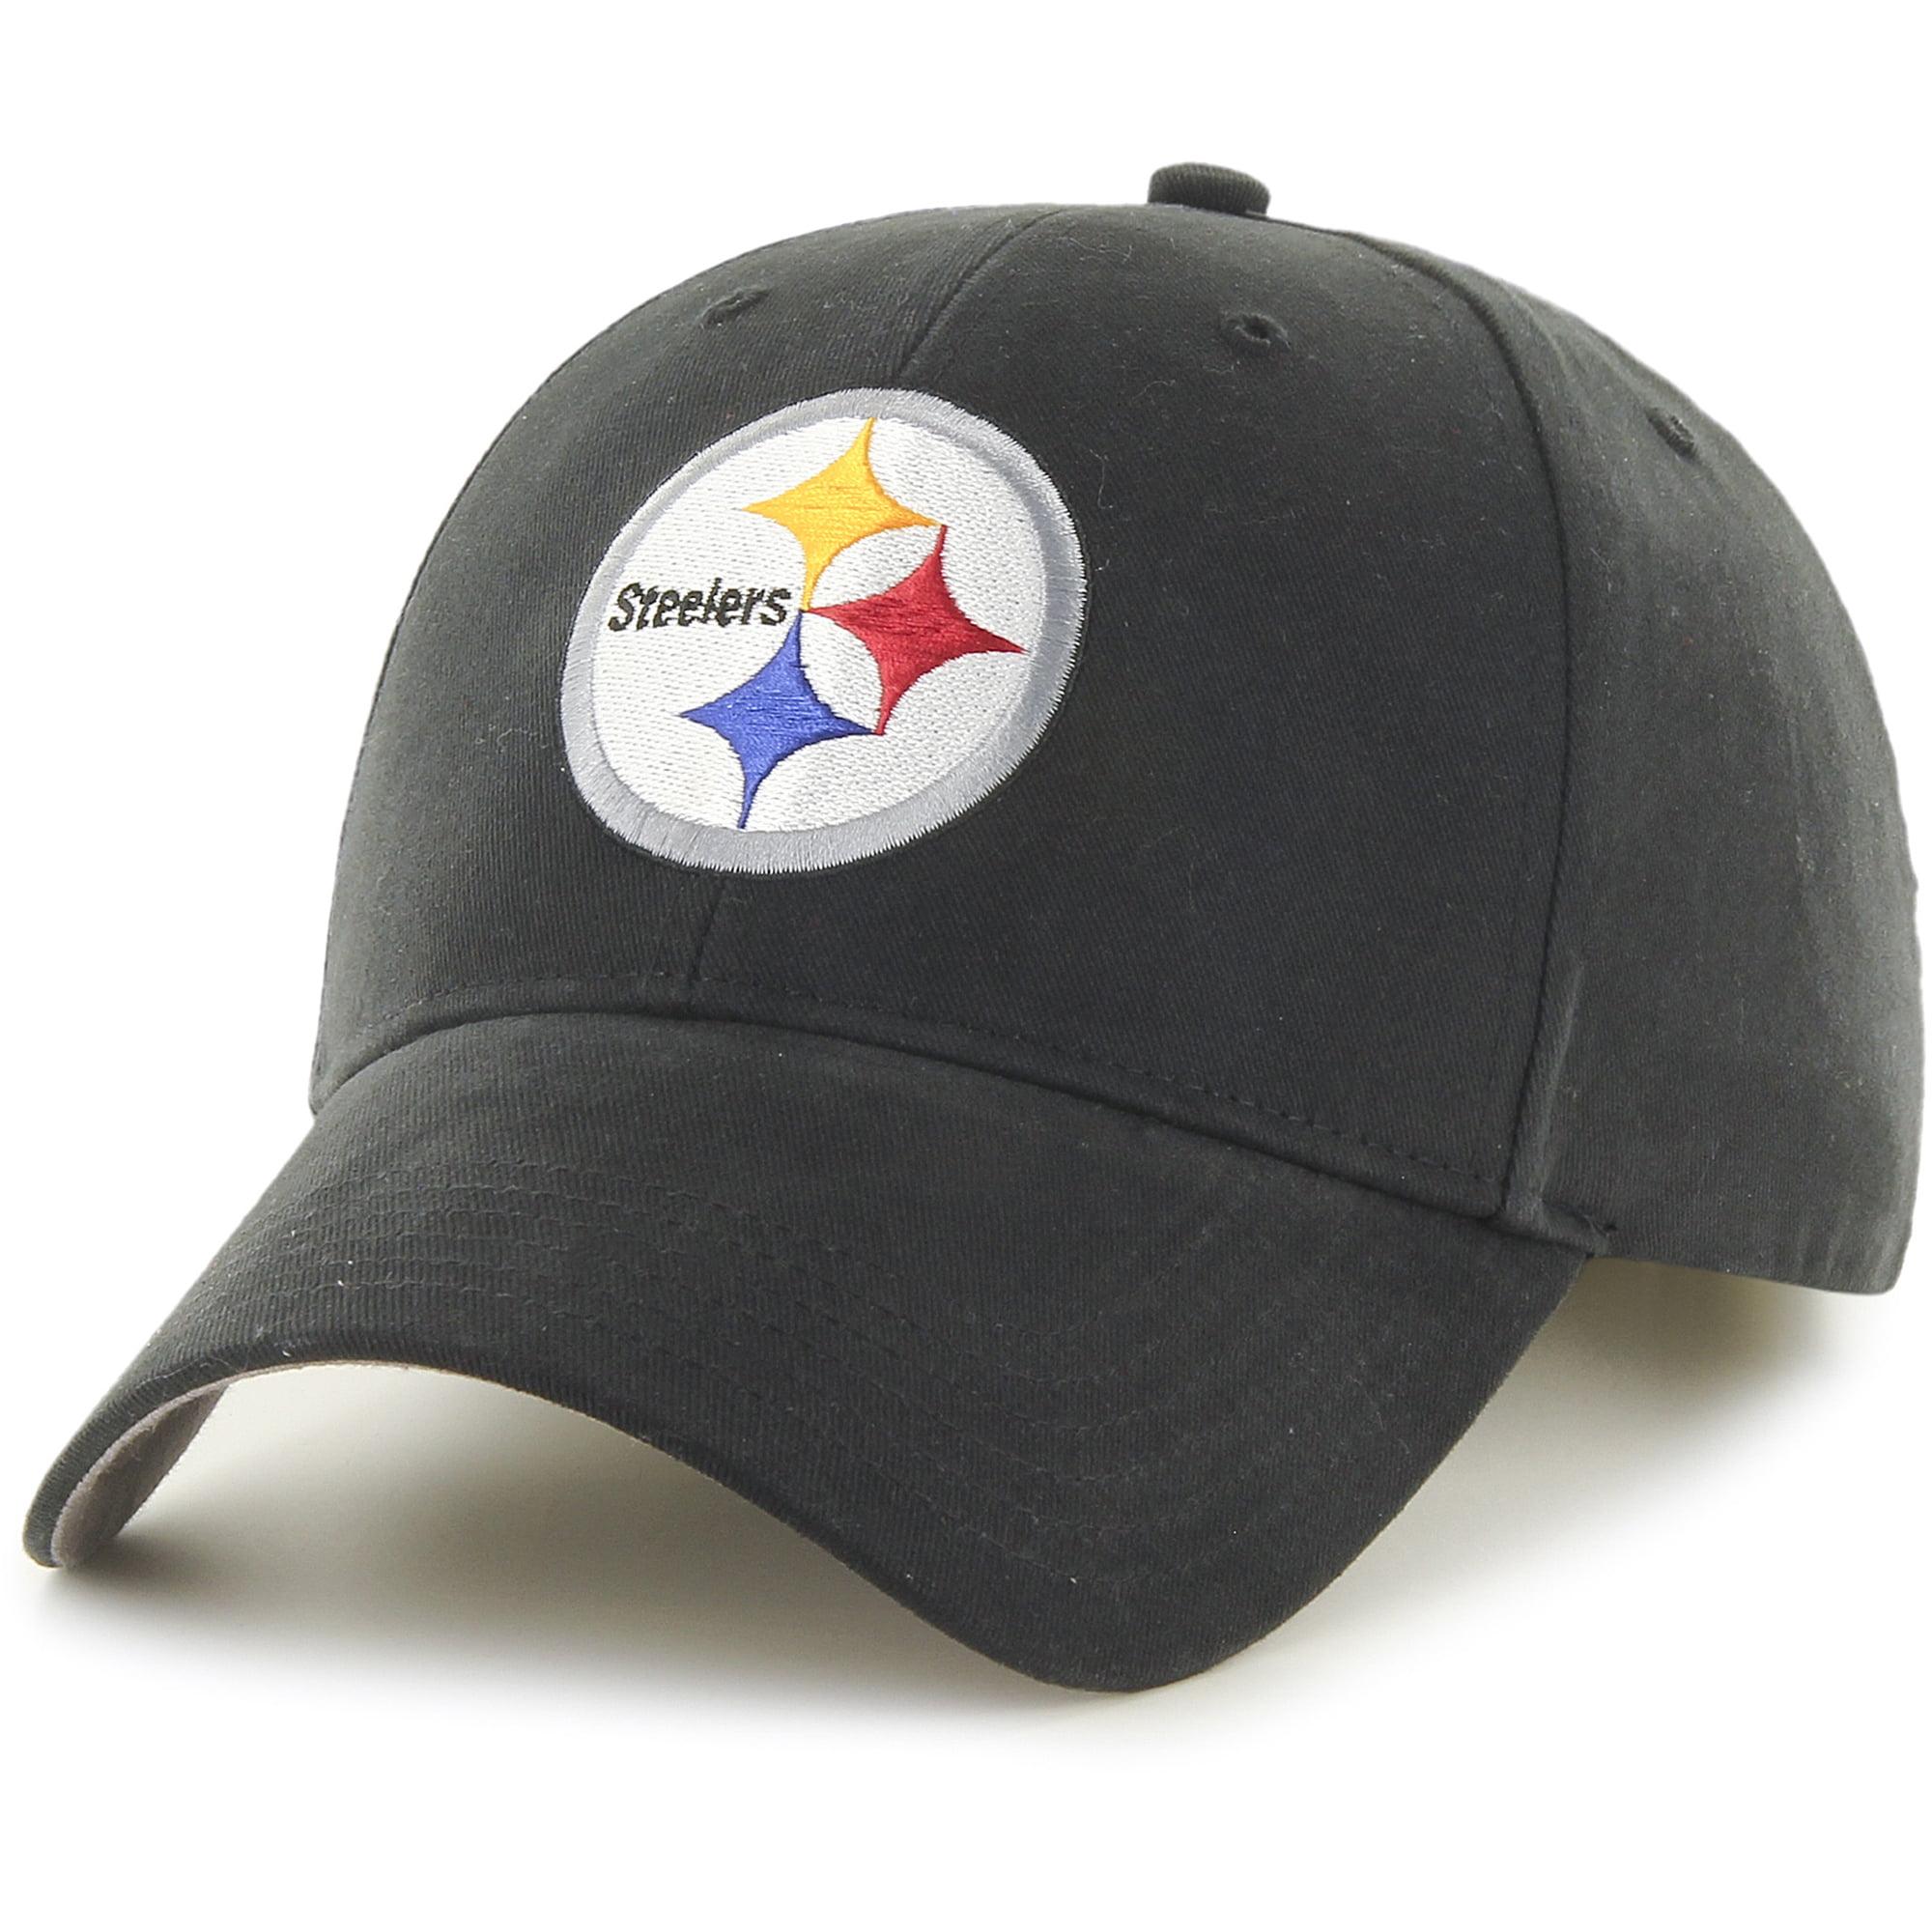 Youth Fan Favorite Black Pittsburgh Steelers Team Basic Adjustable Hat - OSFA